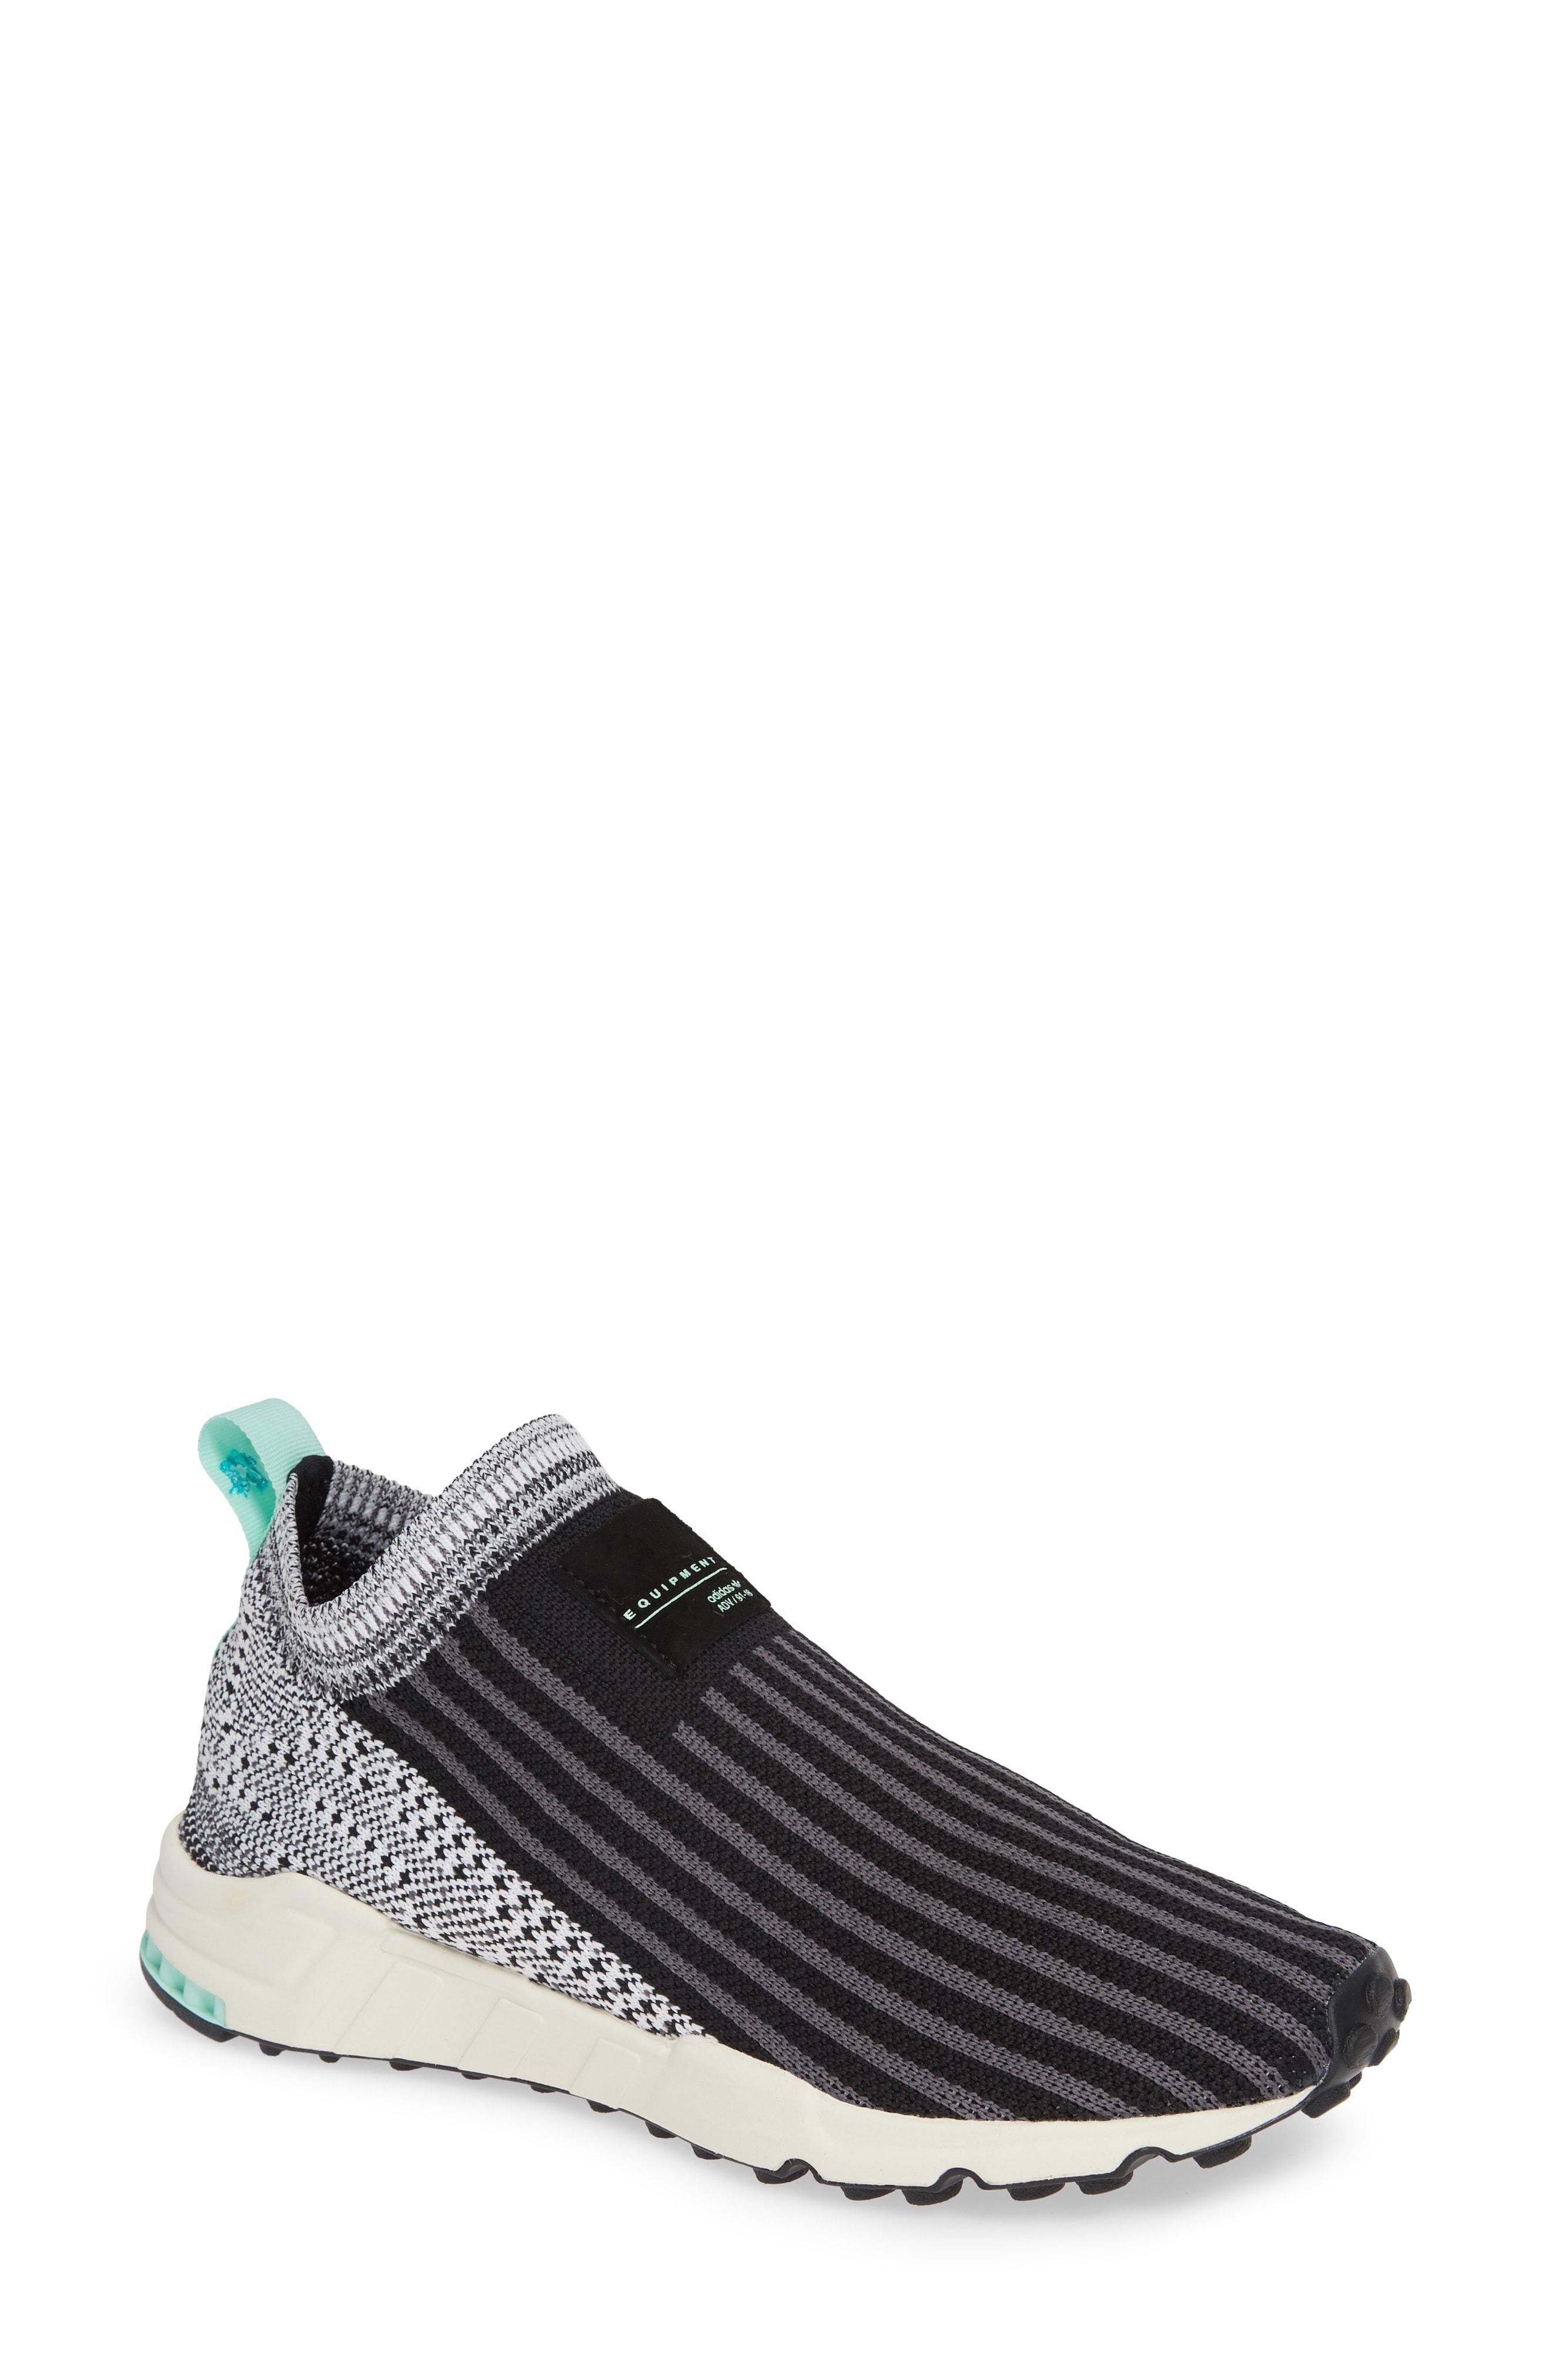 adidas EQT Support Sock Primeknit Sneaker (Women)